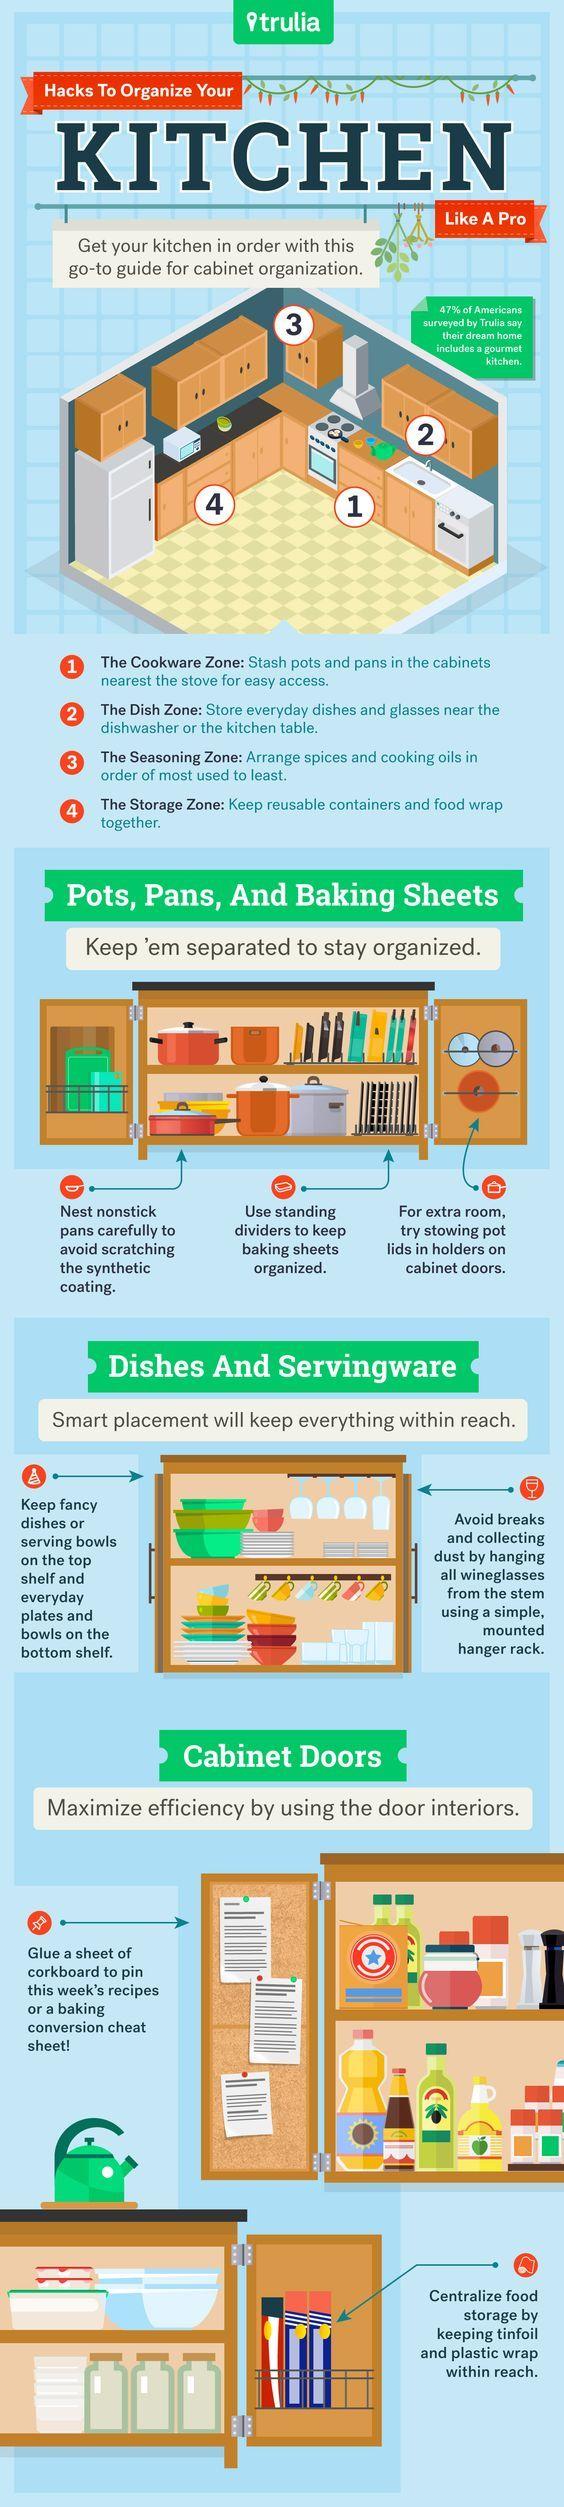 14 Ingenious Kitchen Organization Tips [Infographic]